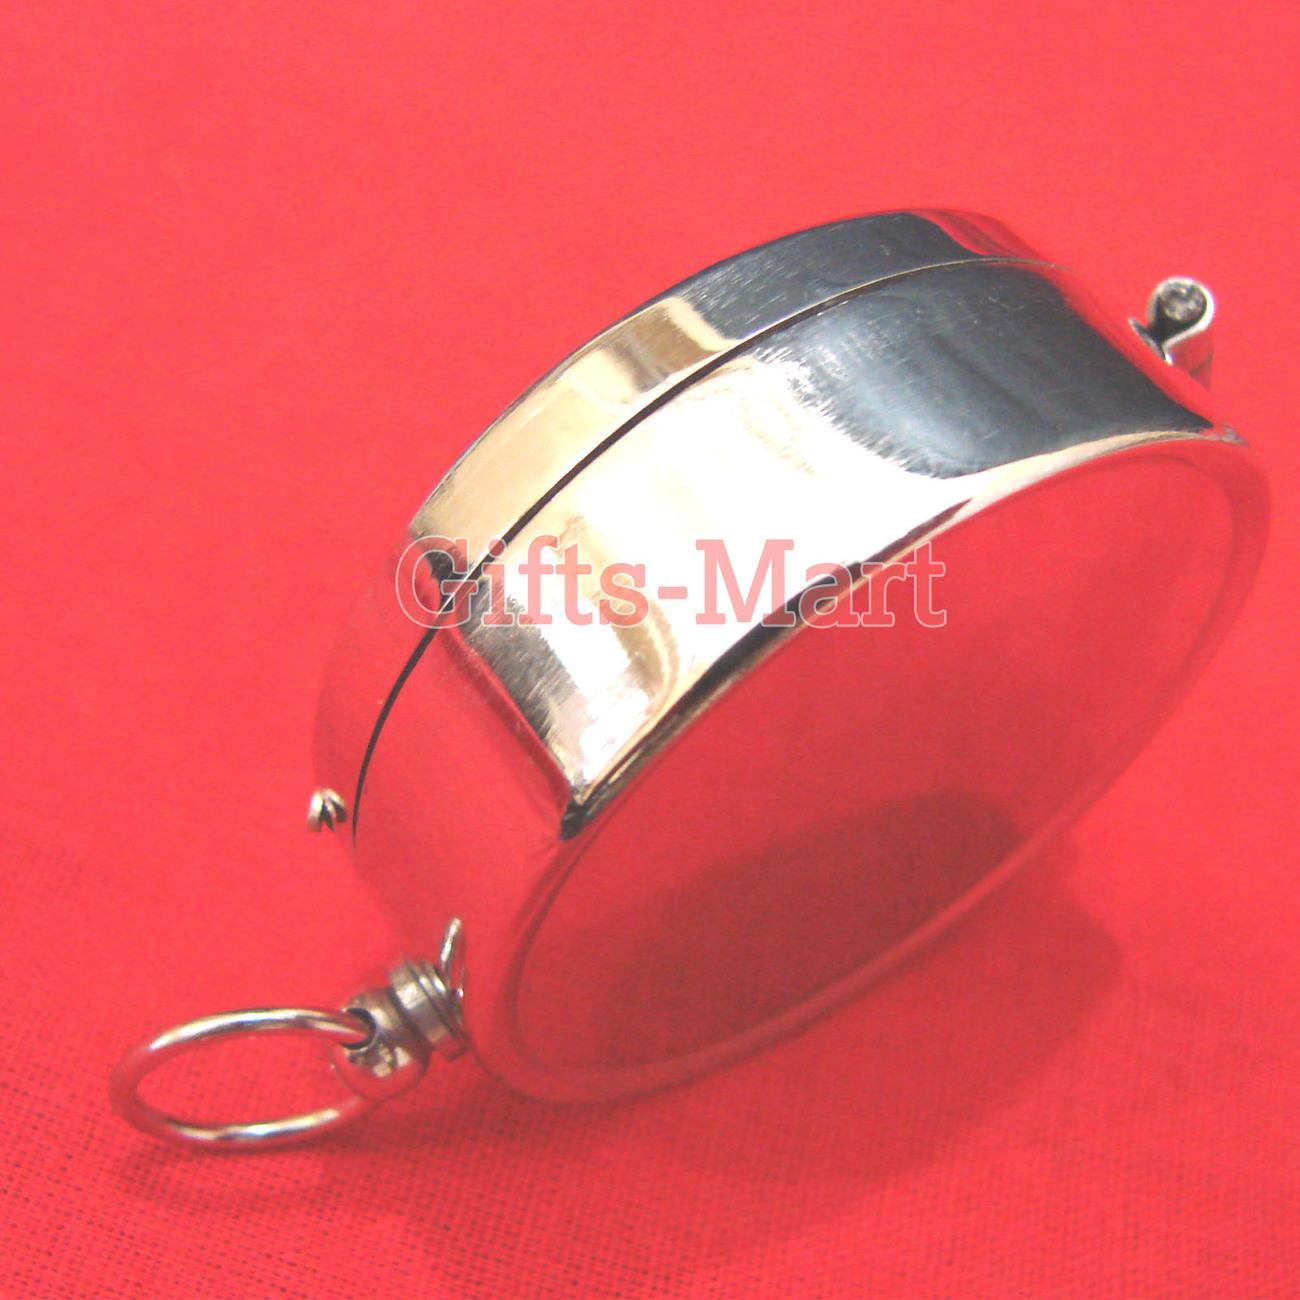 Brass Compass w/ Lid  Wholesale LOT 100 pcs Silver Compass, Keychain Compass